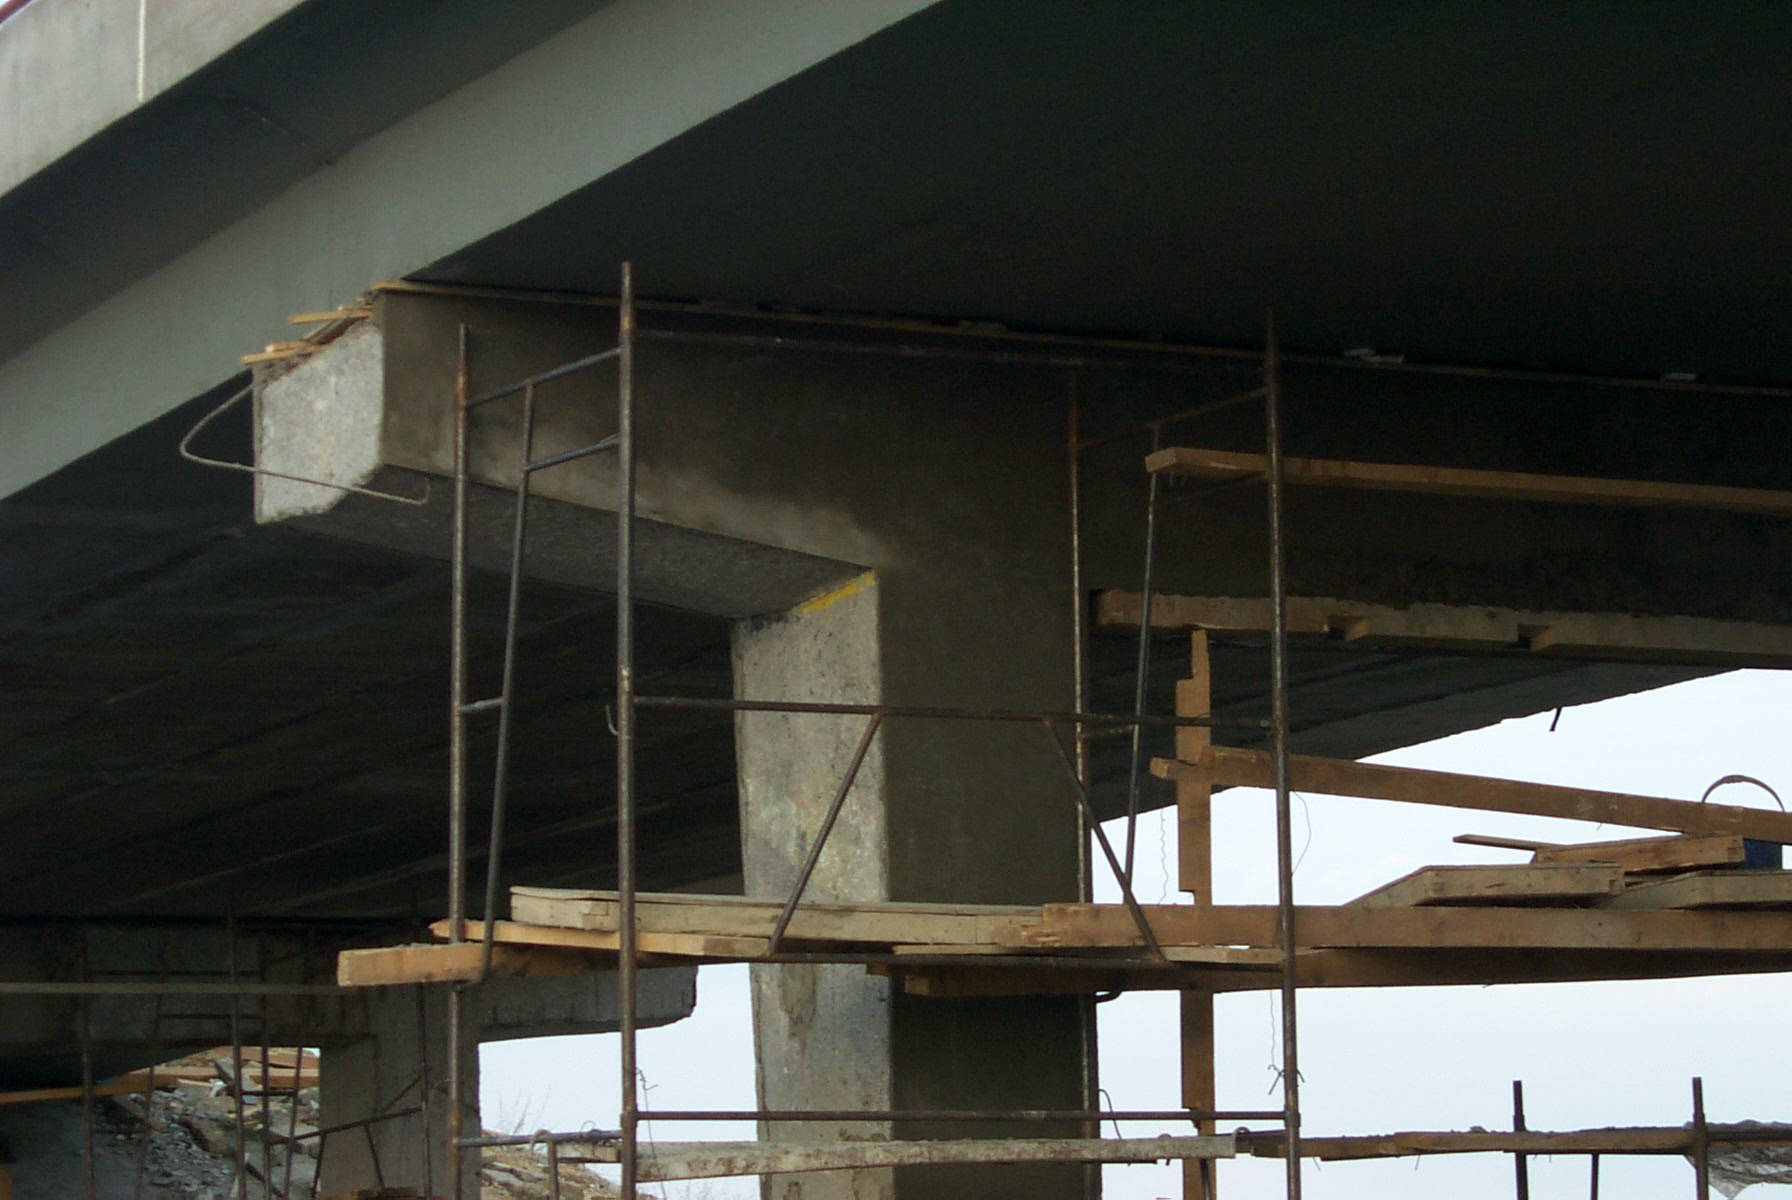 Reparatii pasaje peste Autostrada Bucuresti Pitesti MAPEI - Poza 5